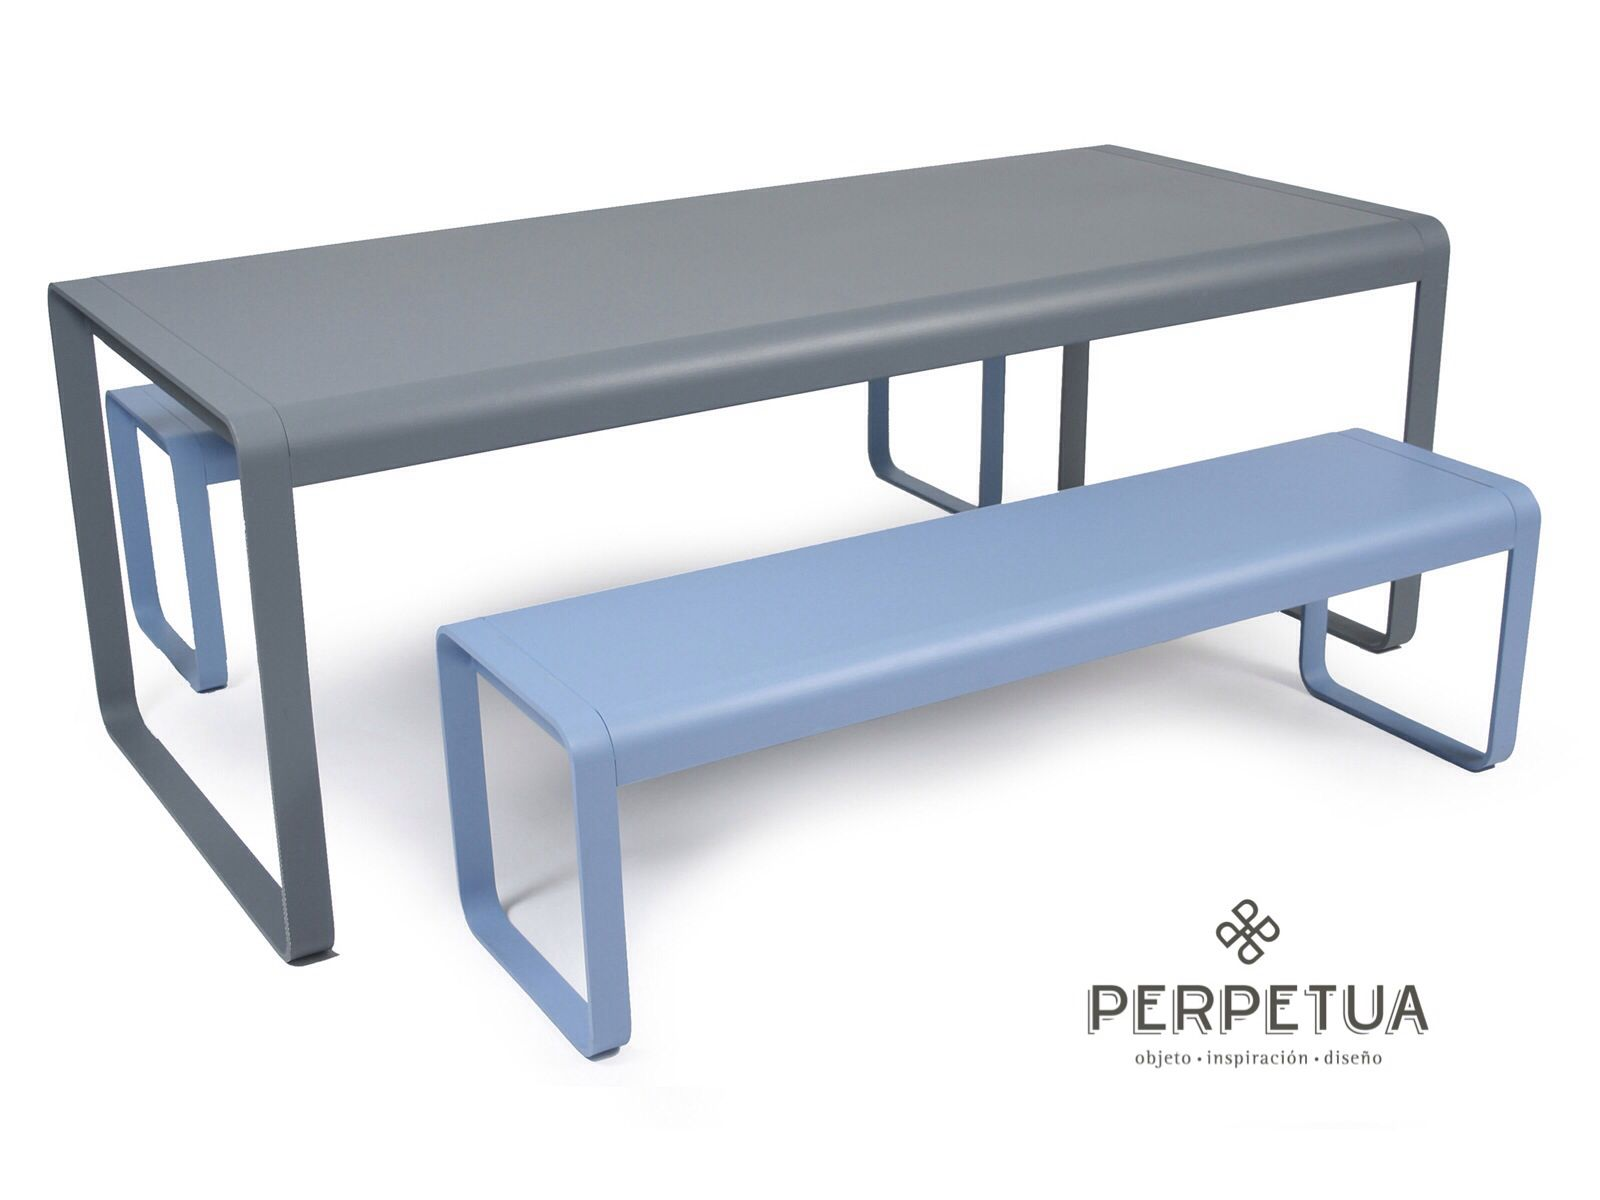 Perpetua muebles #perpetua #muebles #aluminio #mesa #electropintado ...